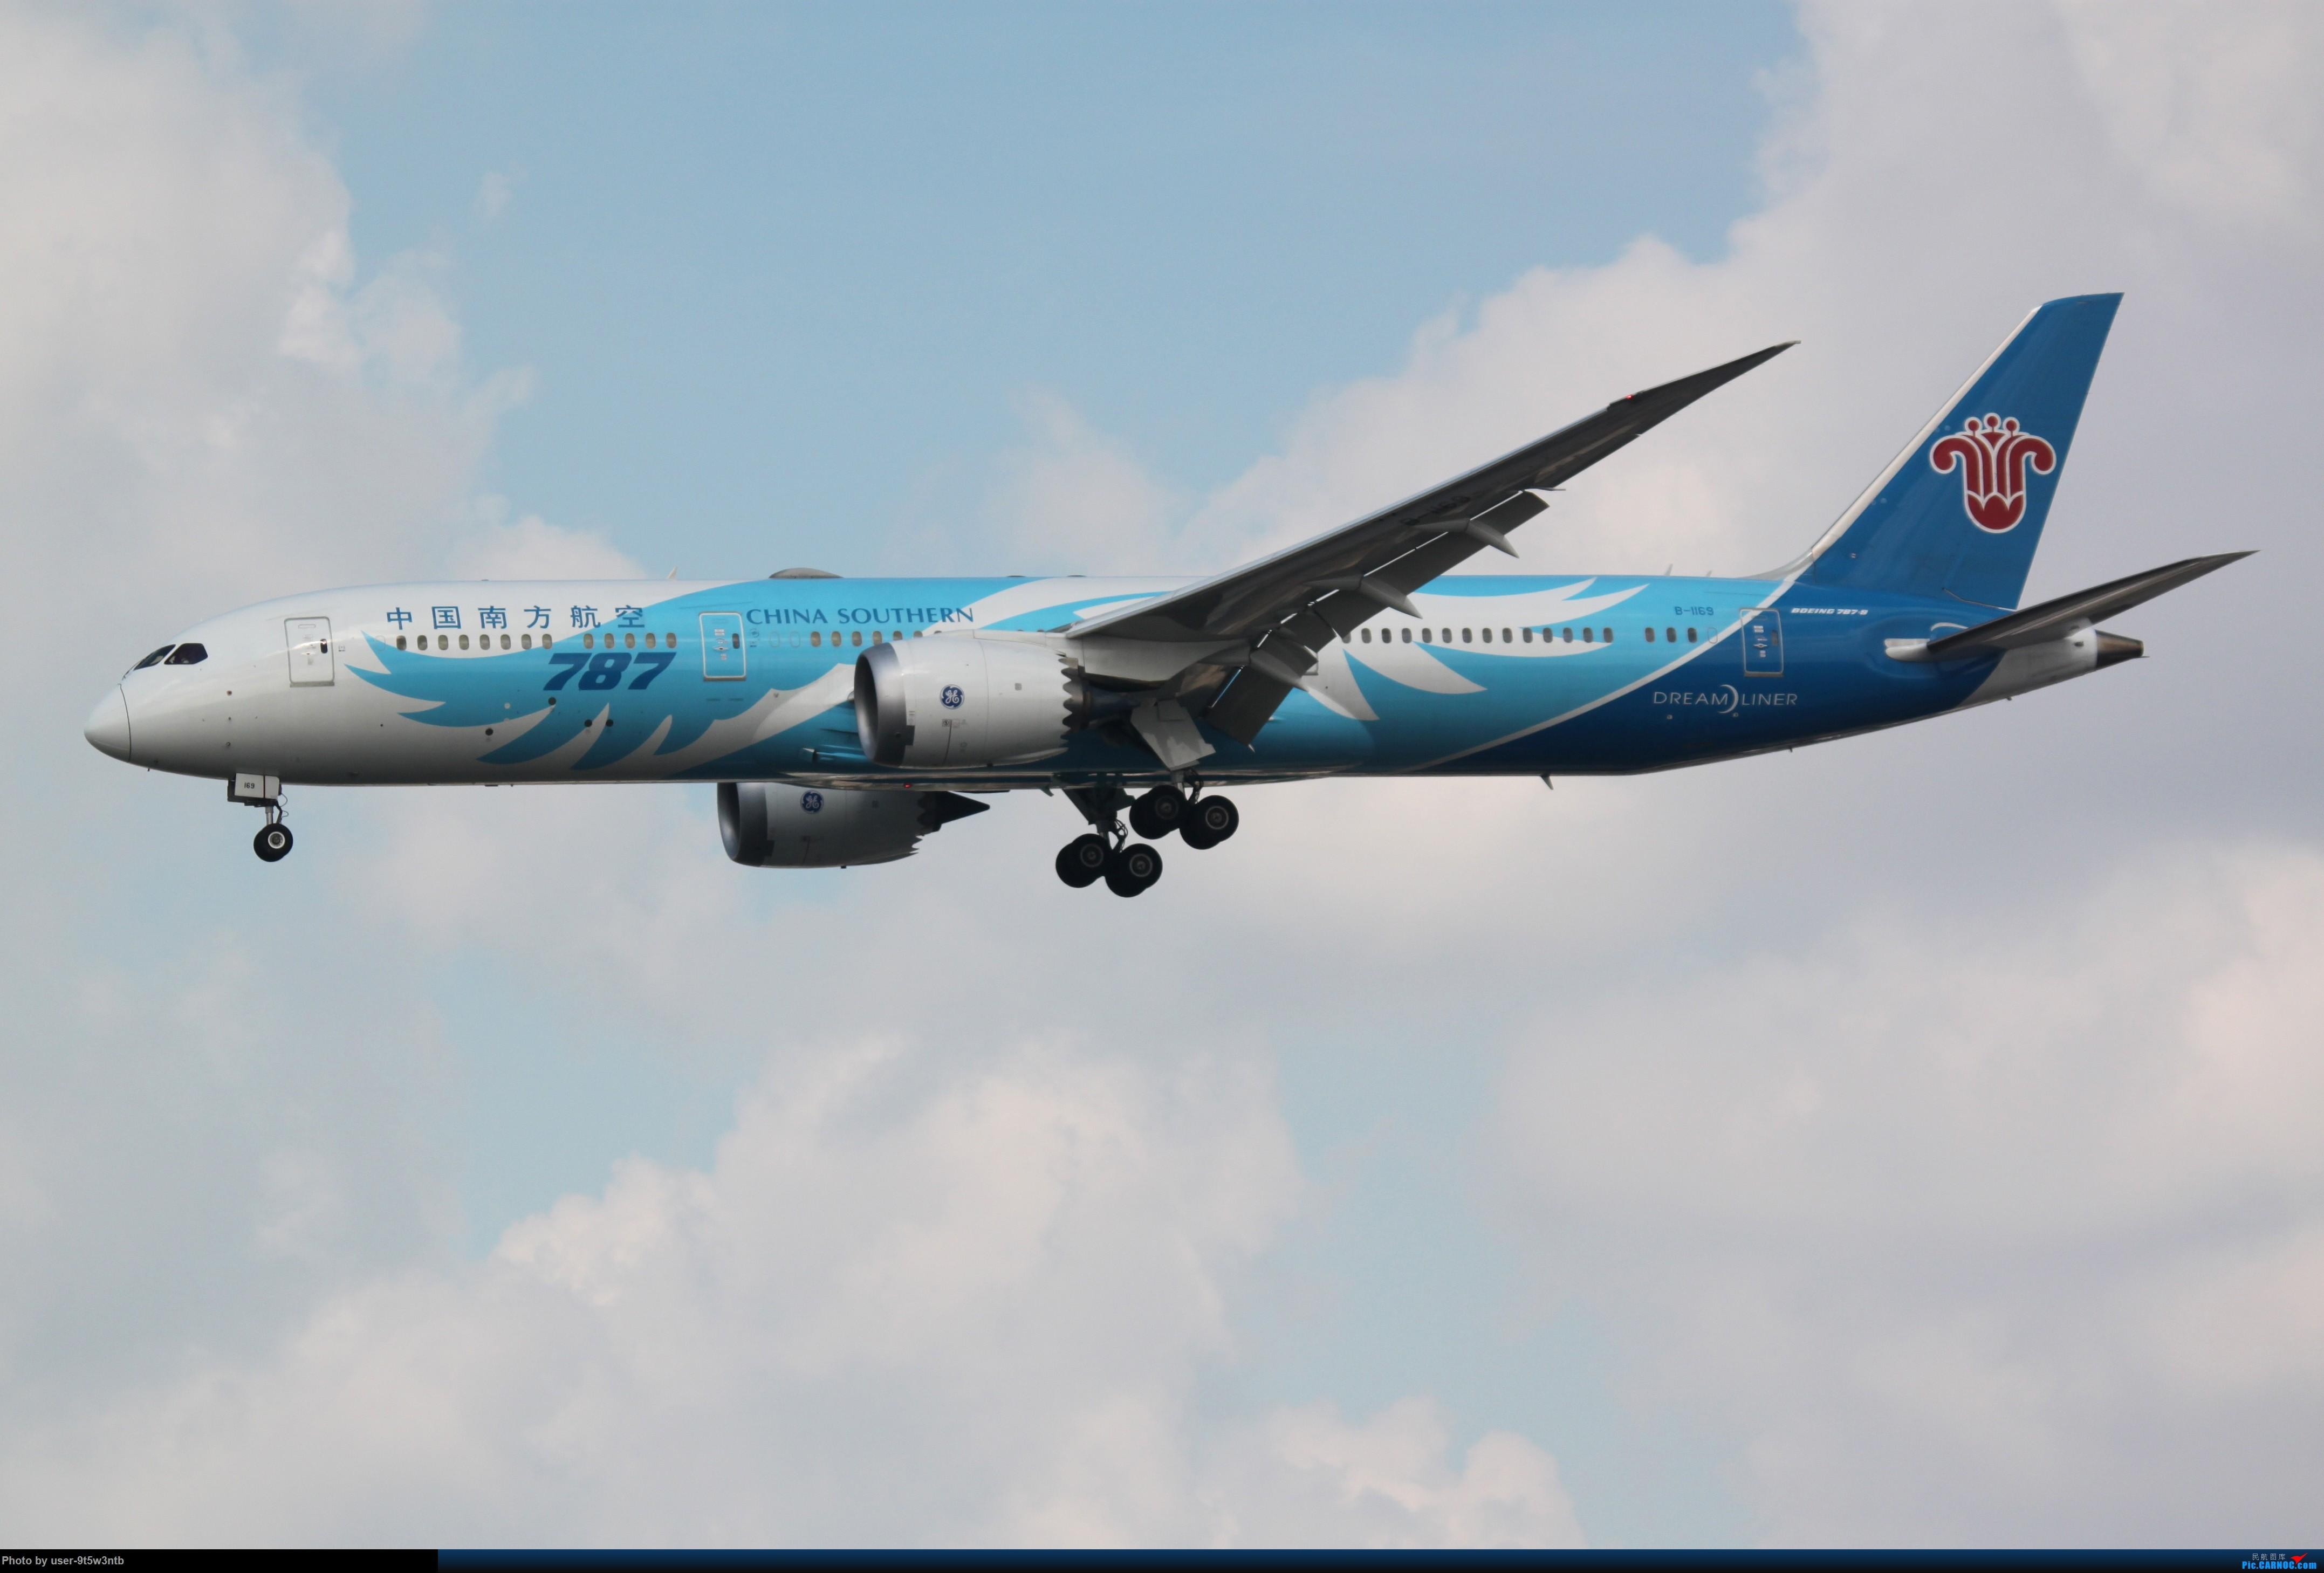 Re:[原创]虹桥机场炎热的早晨 BOEING 787-9 B-1169 中国上海虹桥国际机场